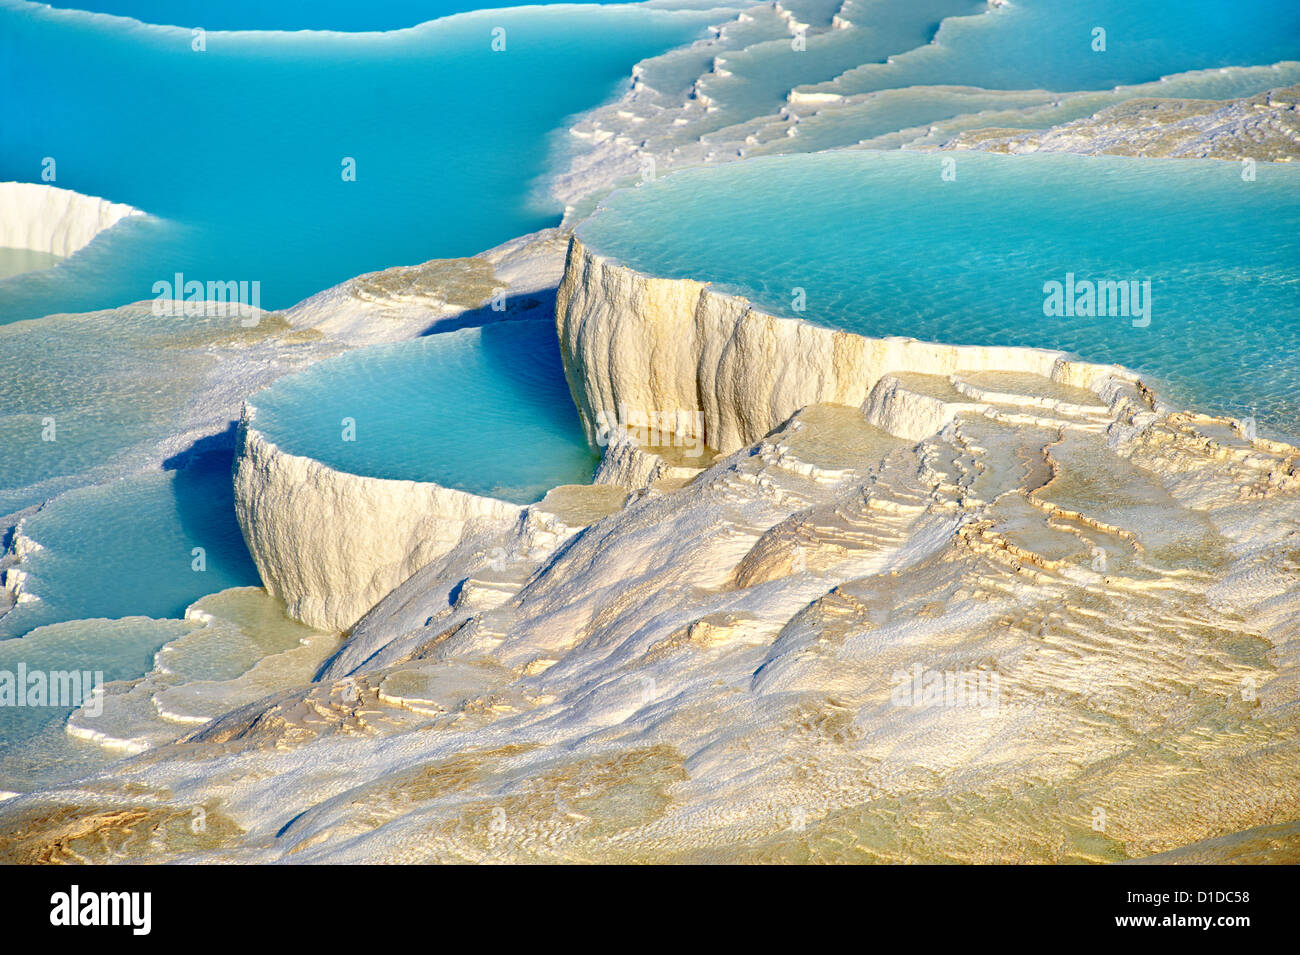 Pamukkale travetine terraza cascadas de agua, compuesto de rocas de carbonato de calcio, Pamukkale, Turquía Foto de stock